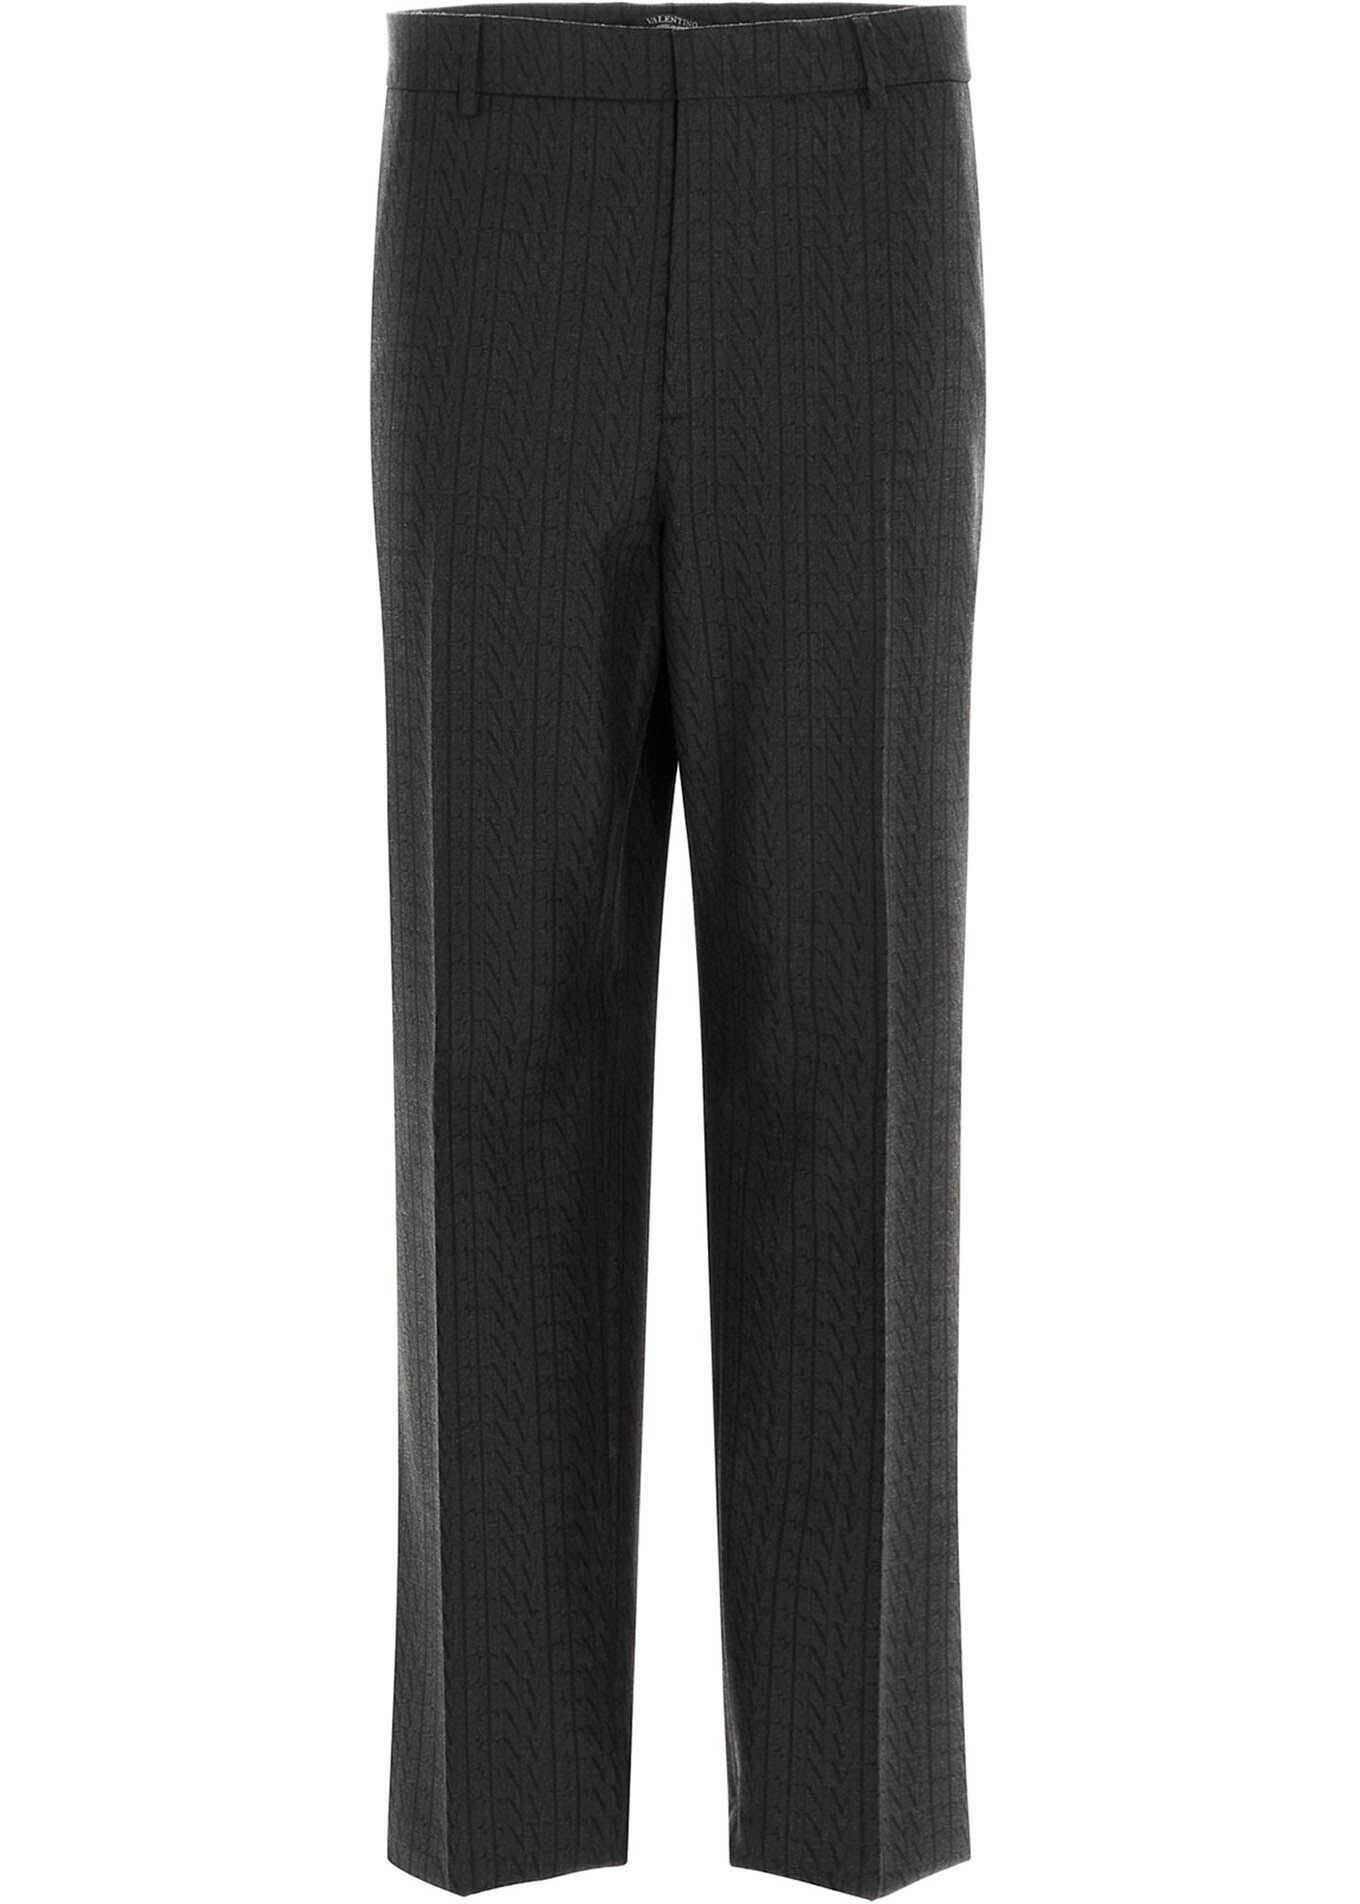 Valentino Garavani All-Over Vltn Straight Pants In Grey Grey imagine